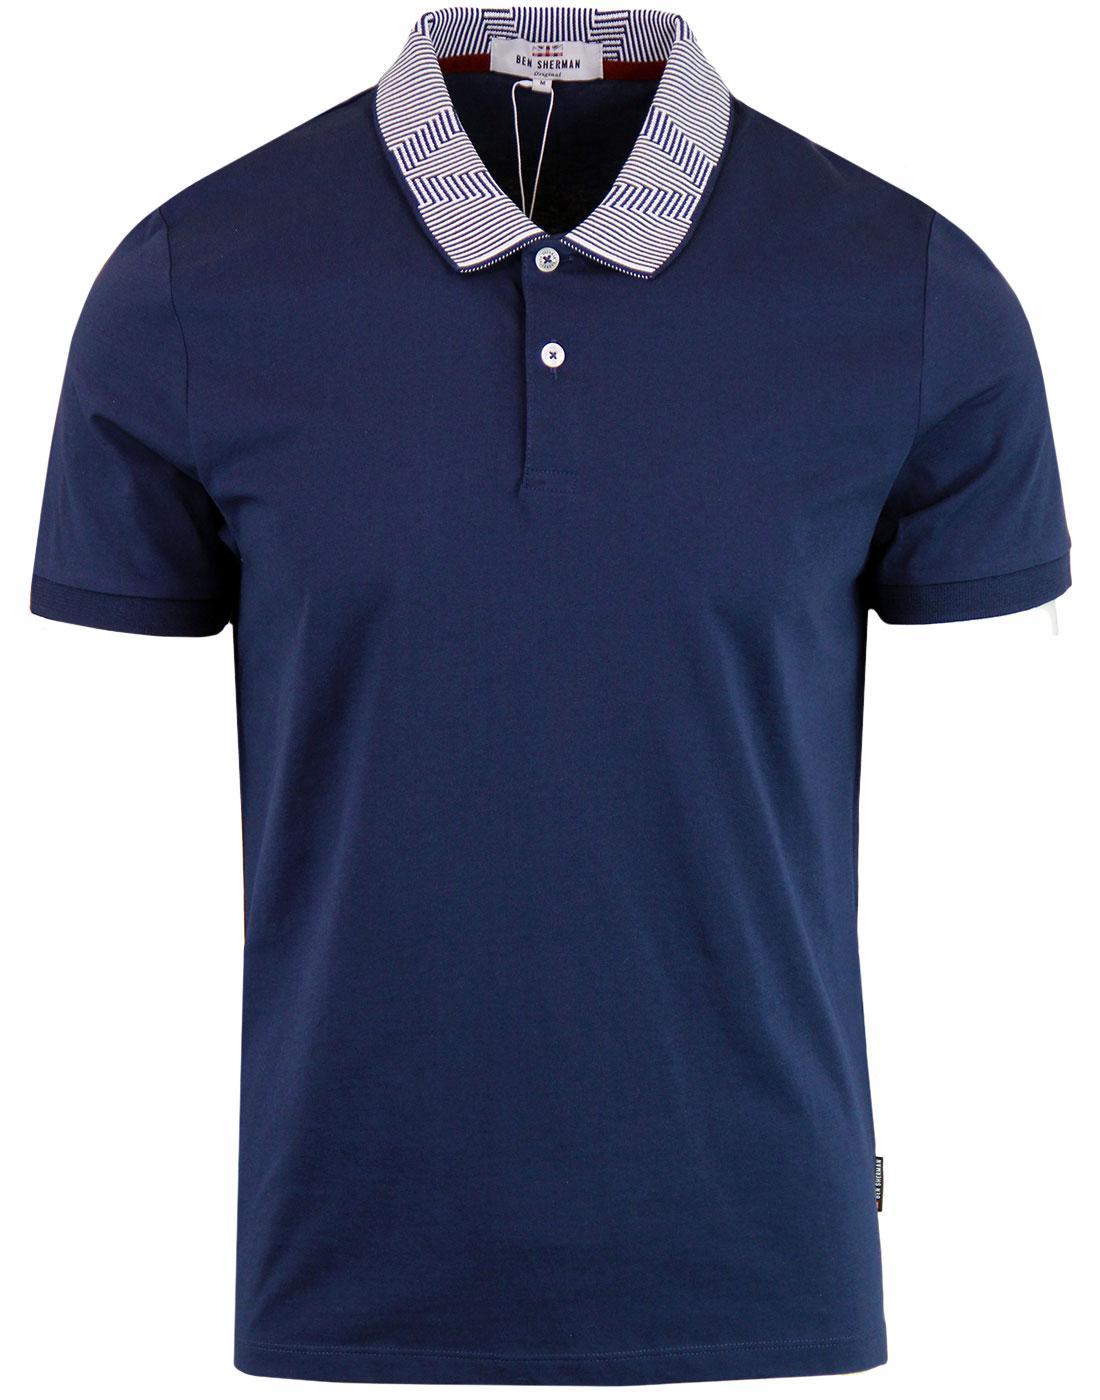 BEN SHERMAN Mod Intarsia Op Art Collar Polo Shirt